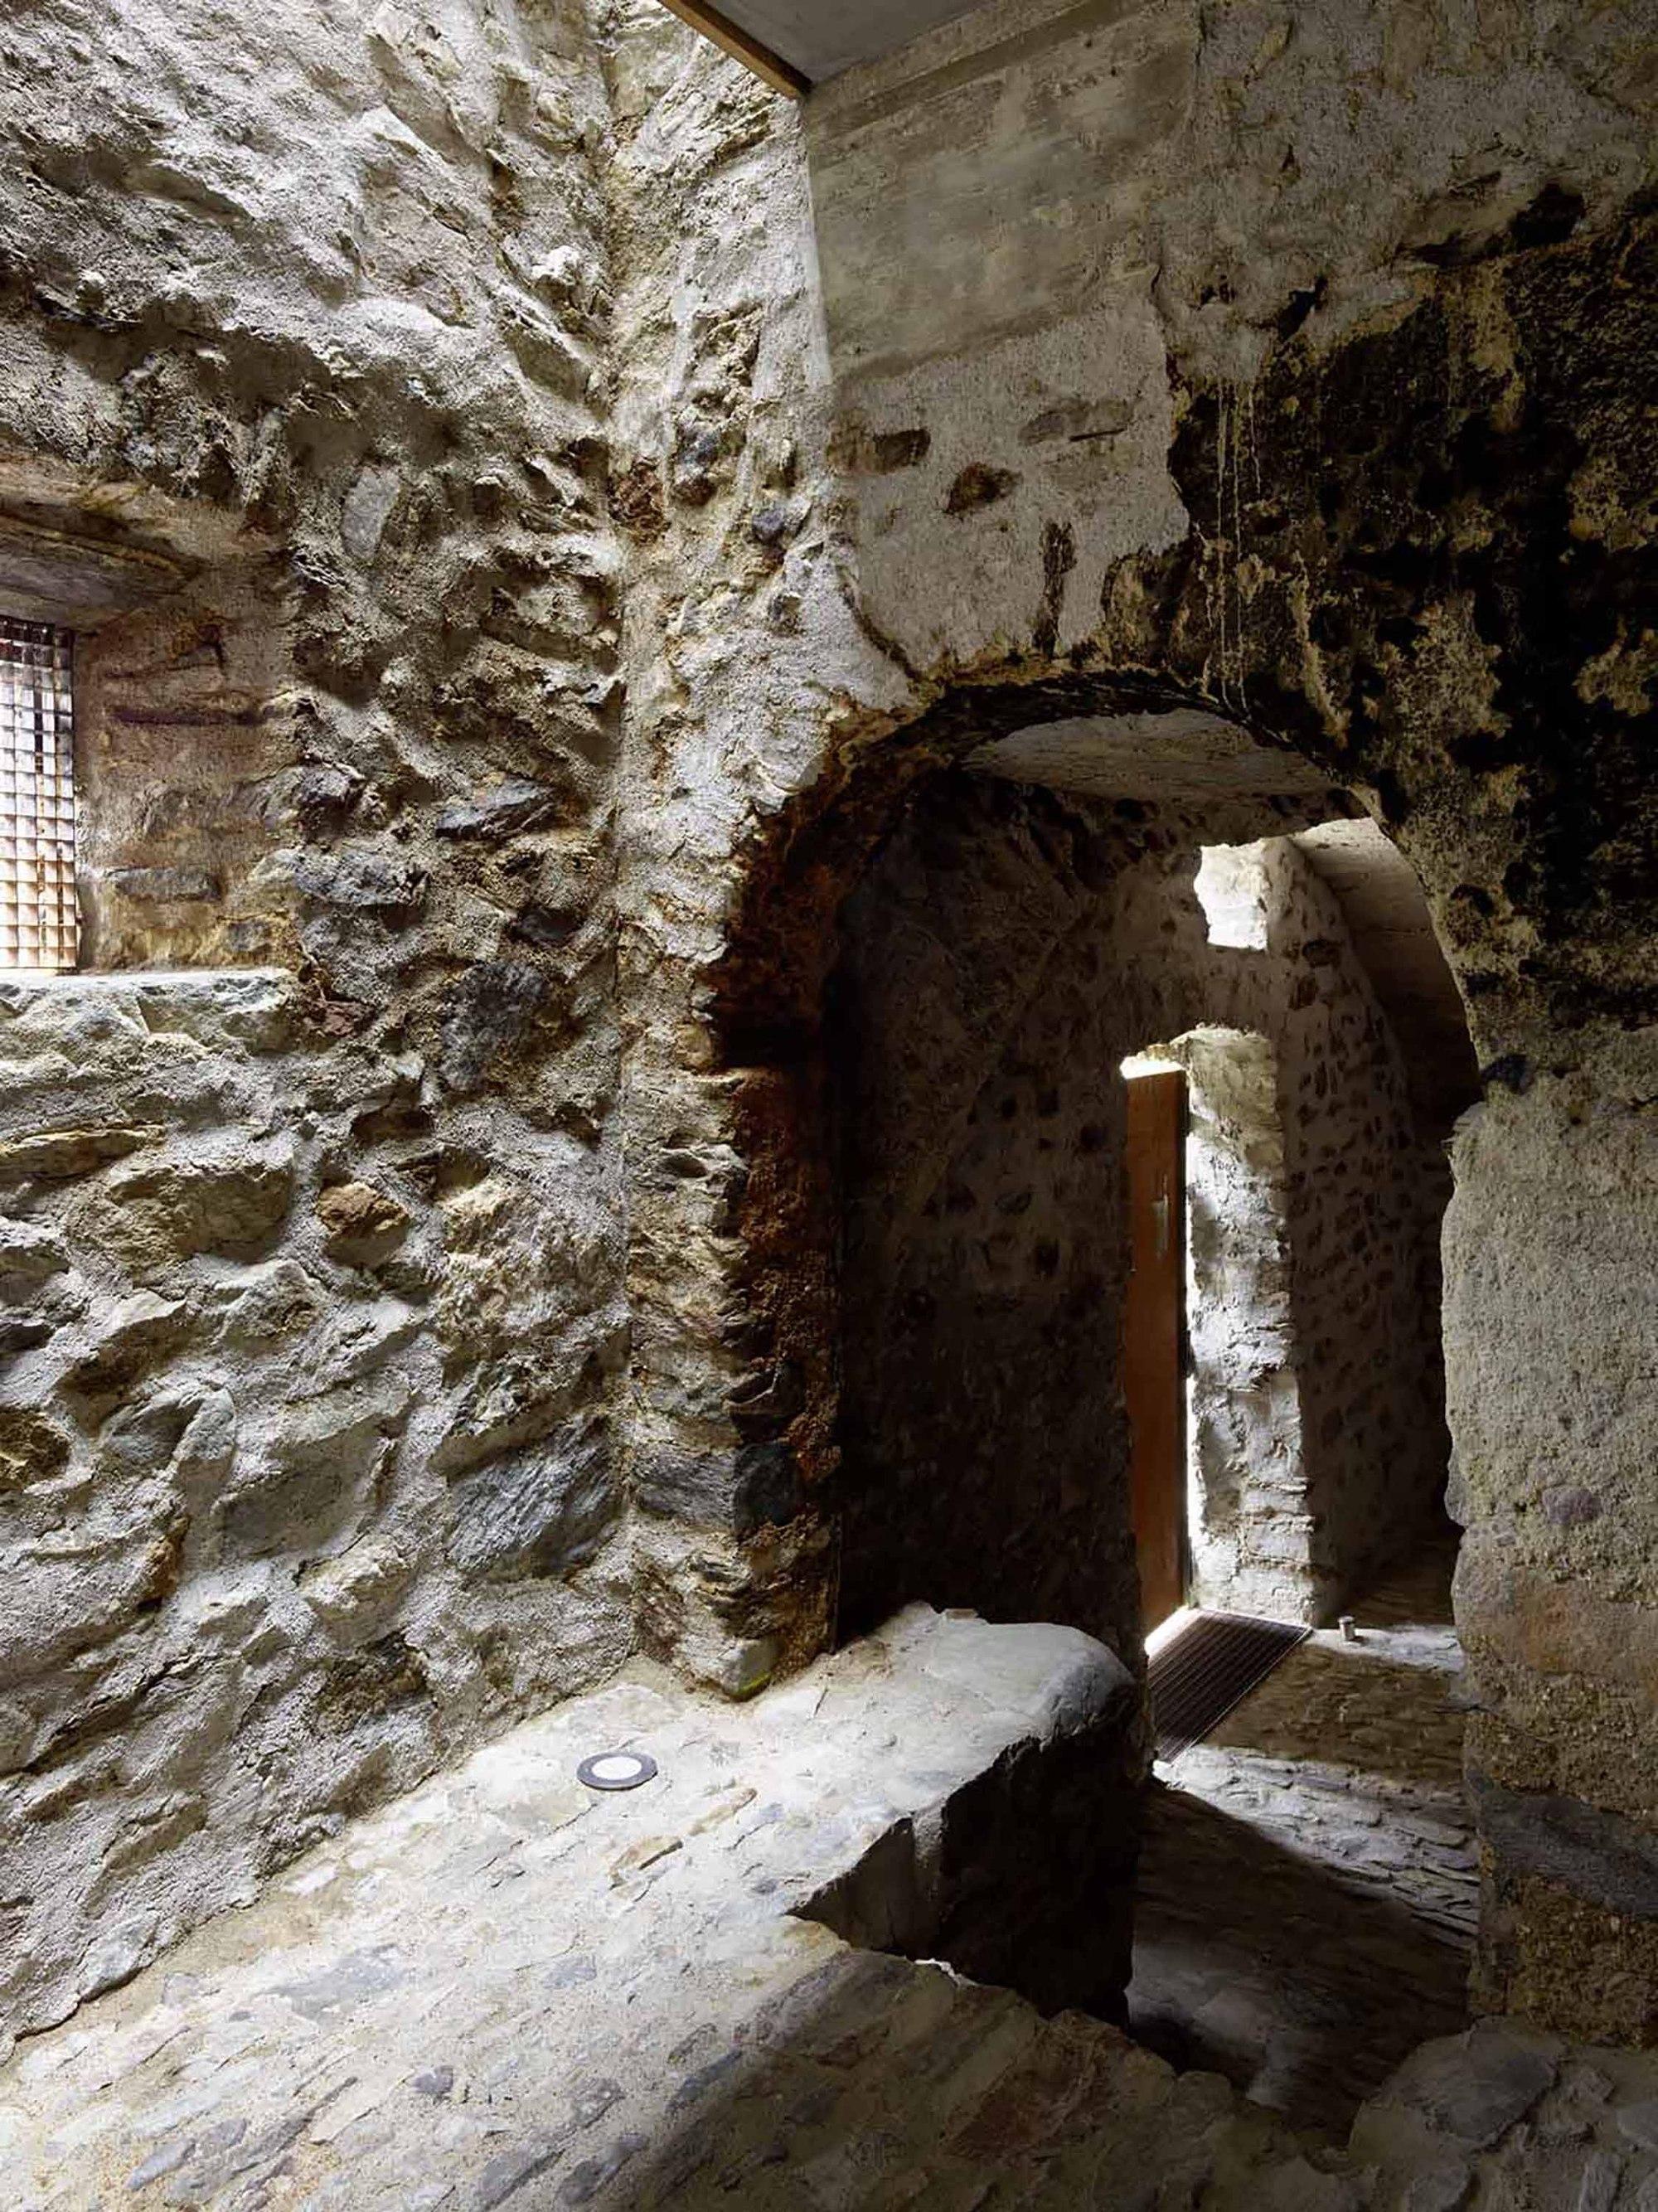 543dd698c07a80762d000255_stone-house-transformation-in-scaiano-wespi-de-meuron-romeo-architects_1430_cf031781r.jpg